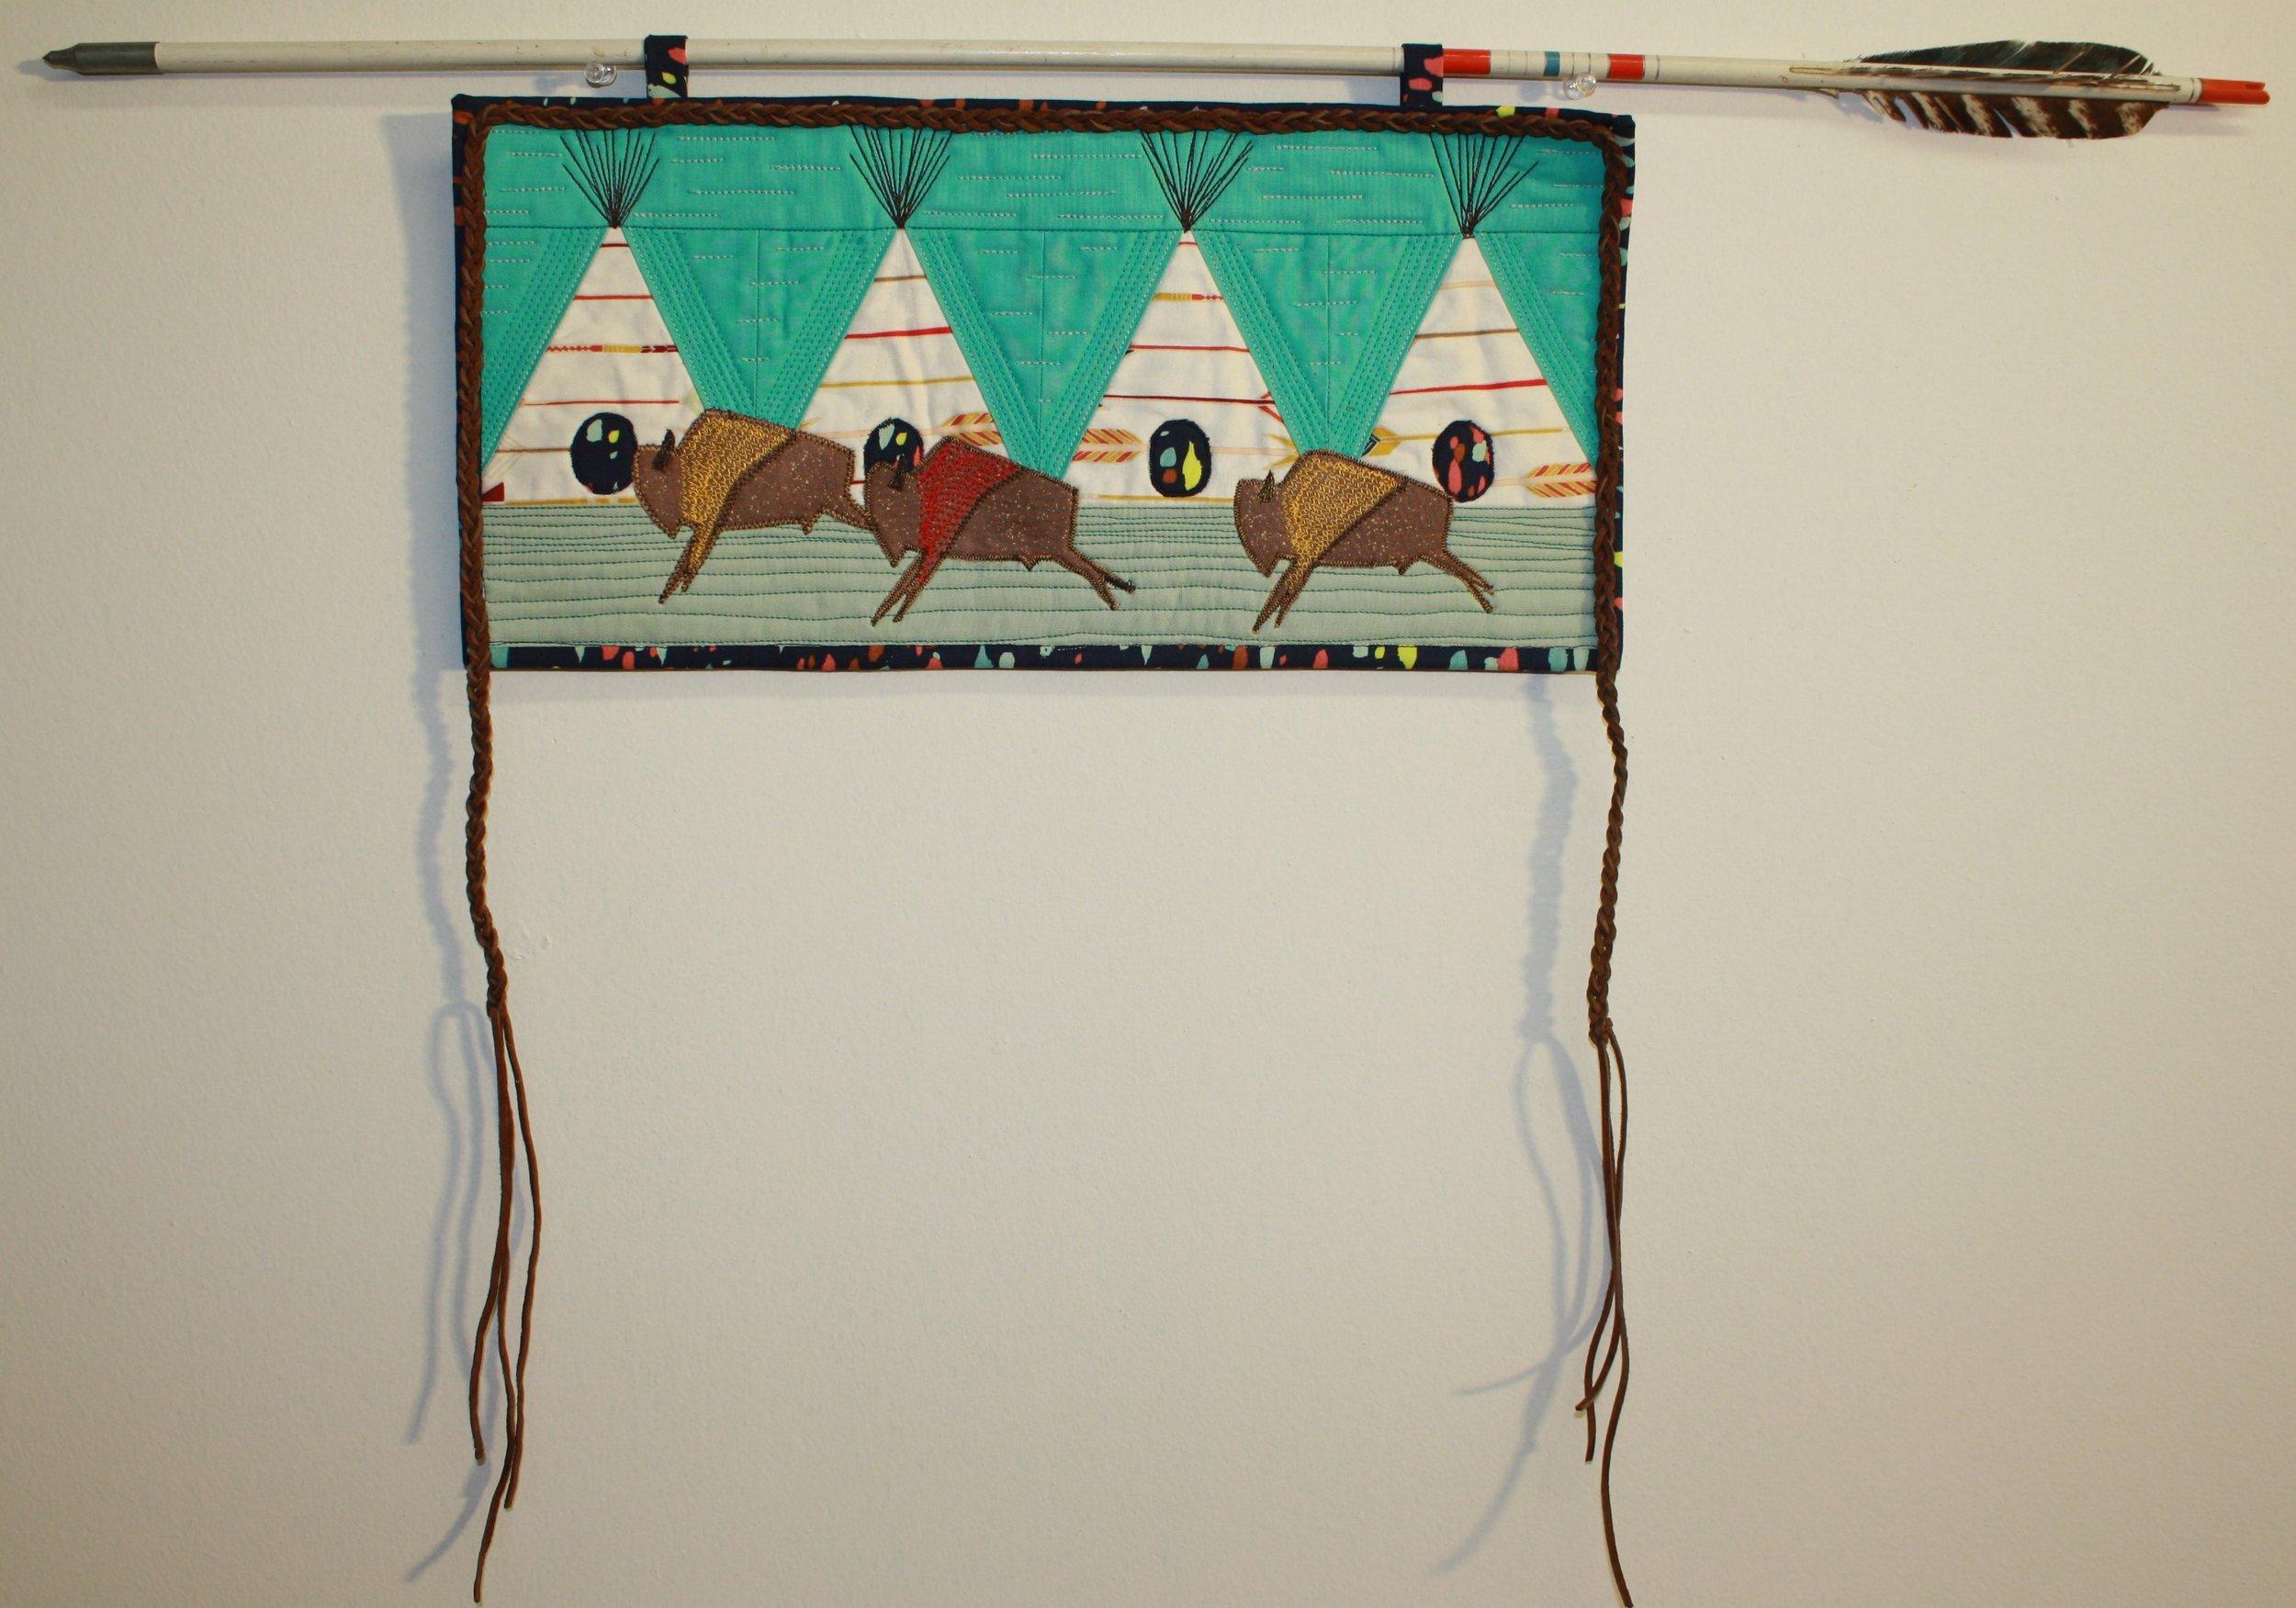 Buffalo, braids and arrows